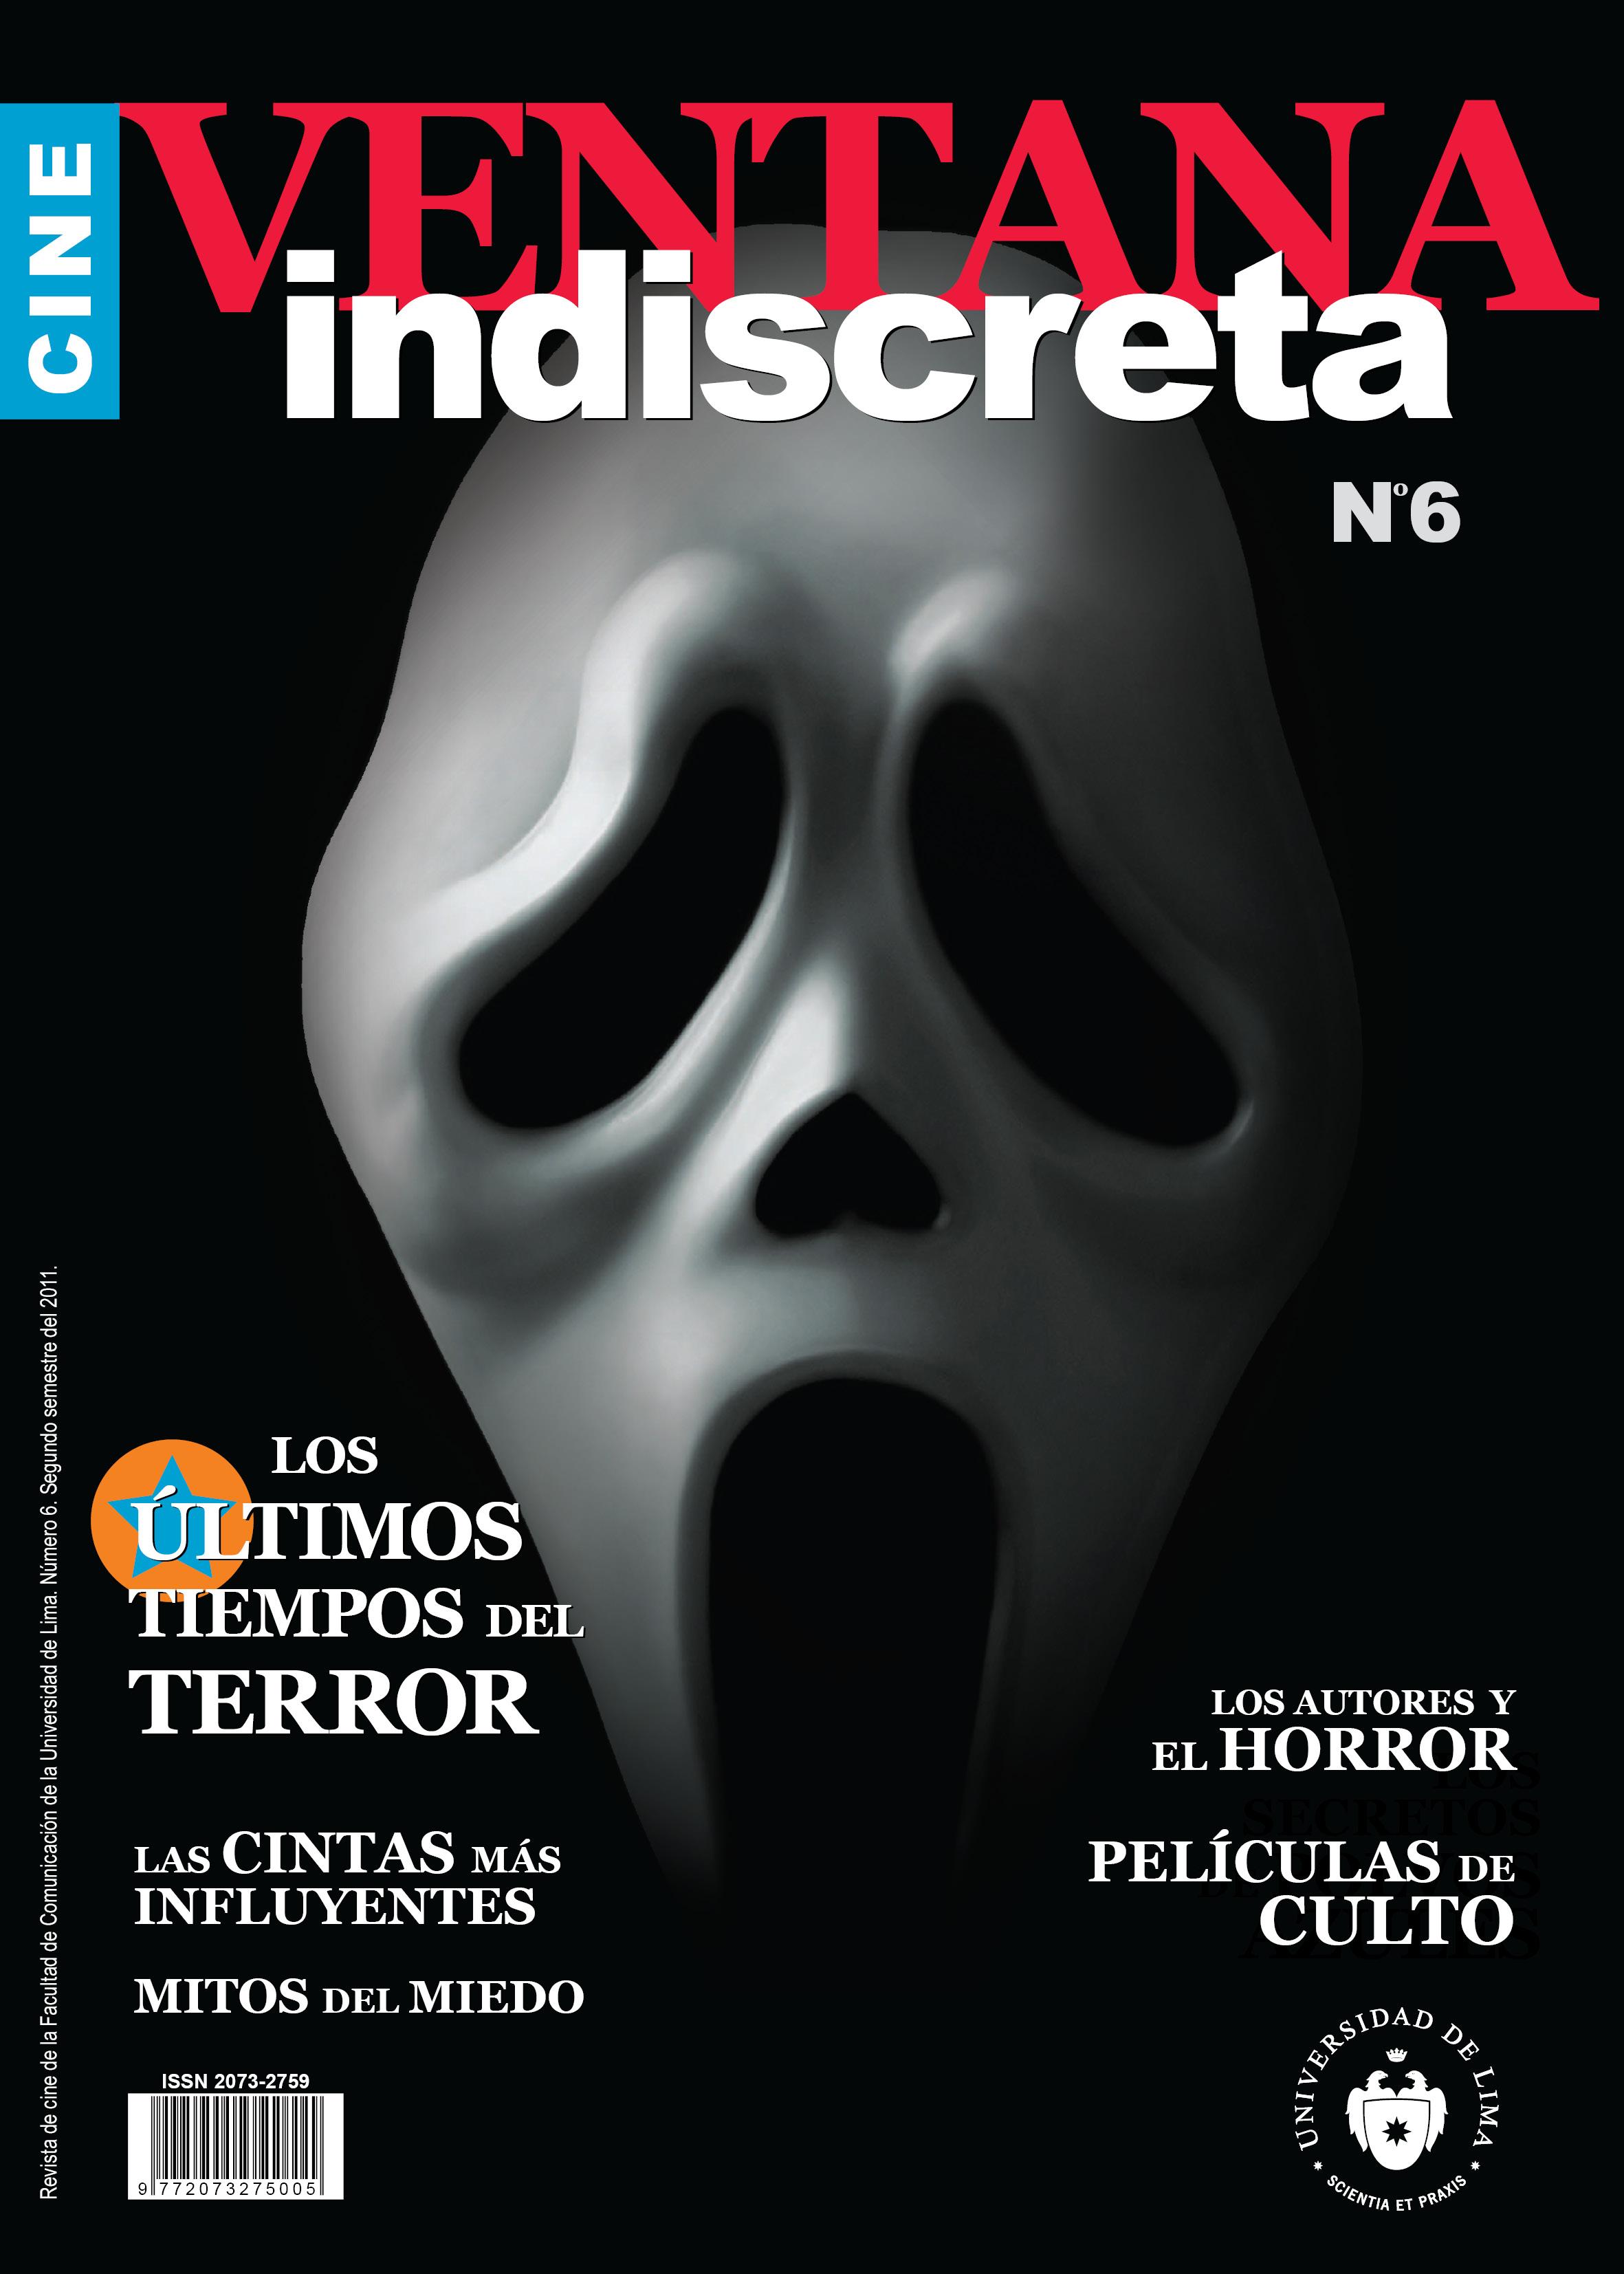 Ventana Indiscreta 6